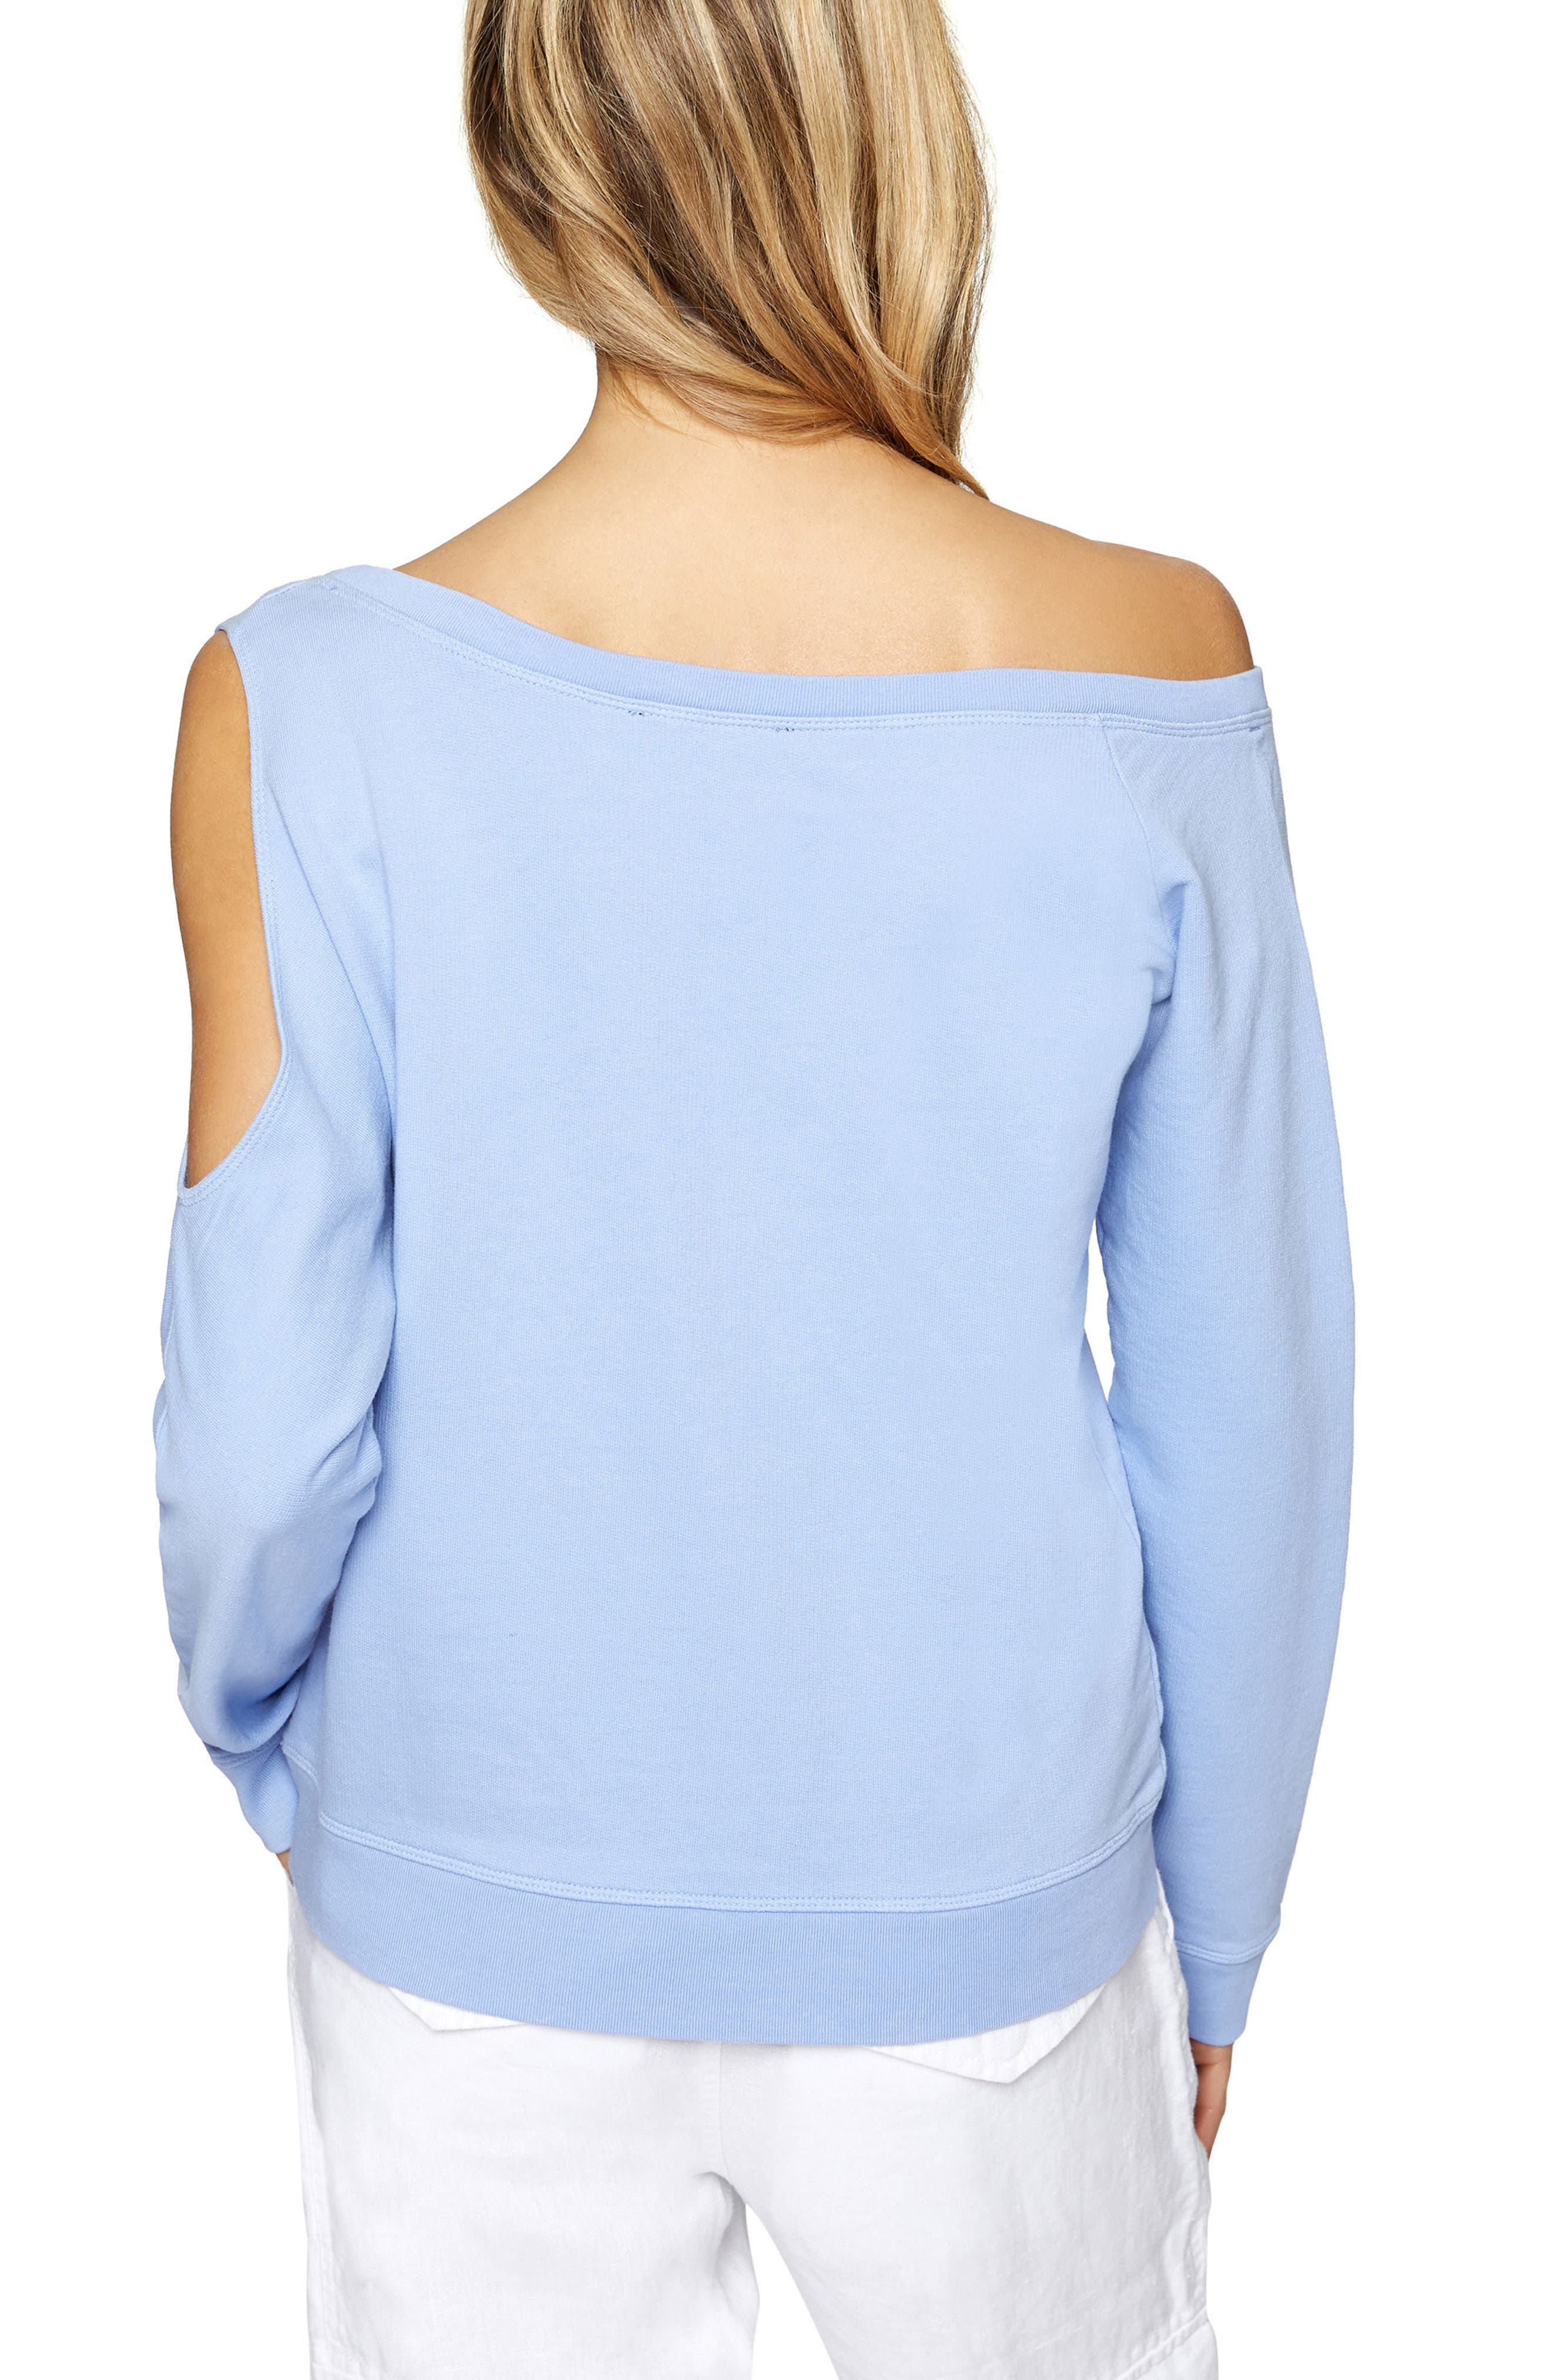 Alexi Asymmetrical Sweatshirt,                             Alternate thumbnail 2, color,                             450